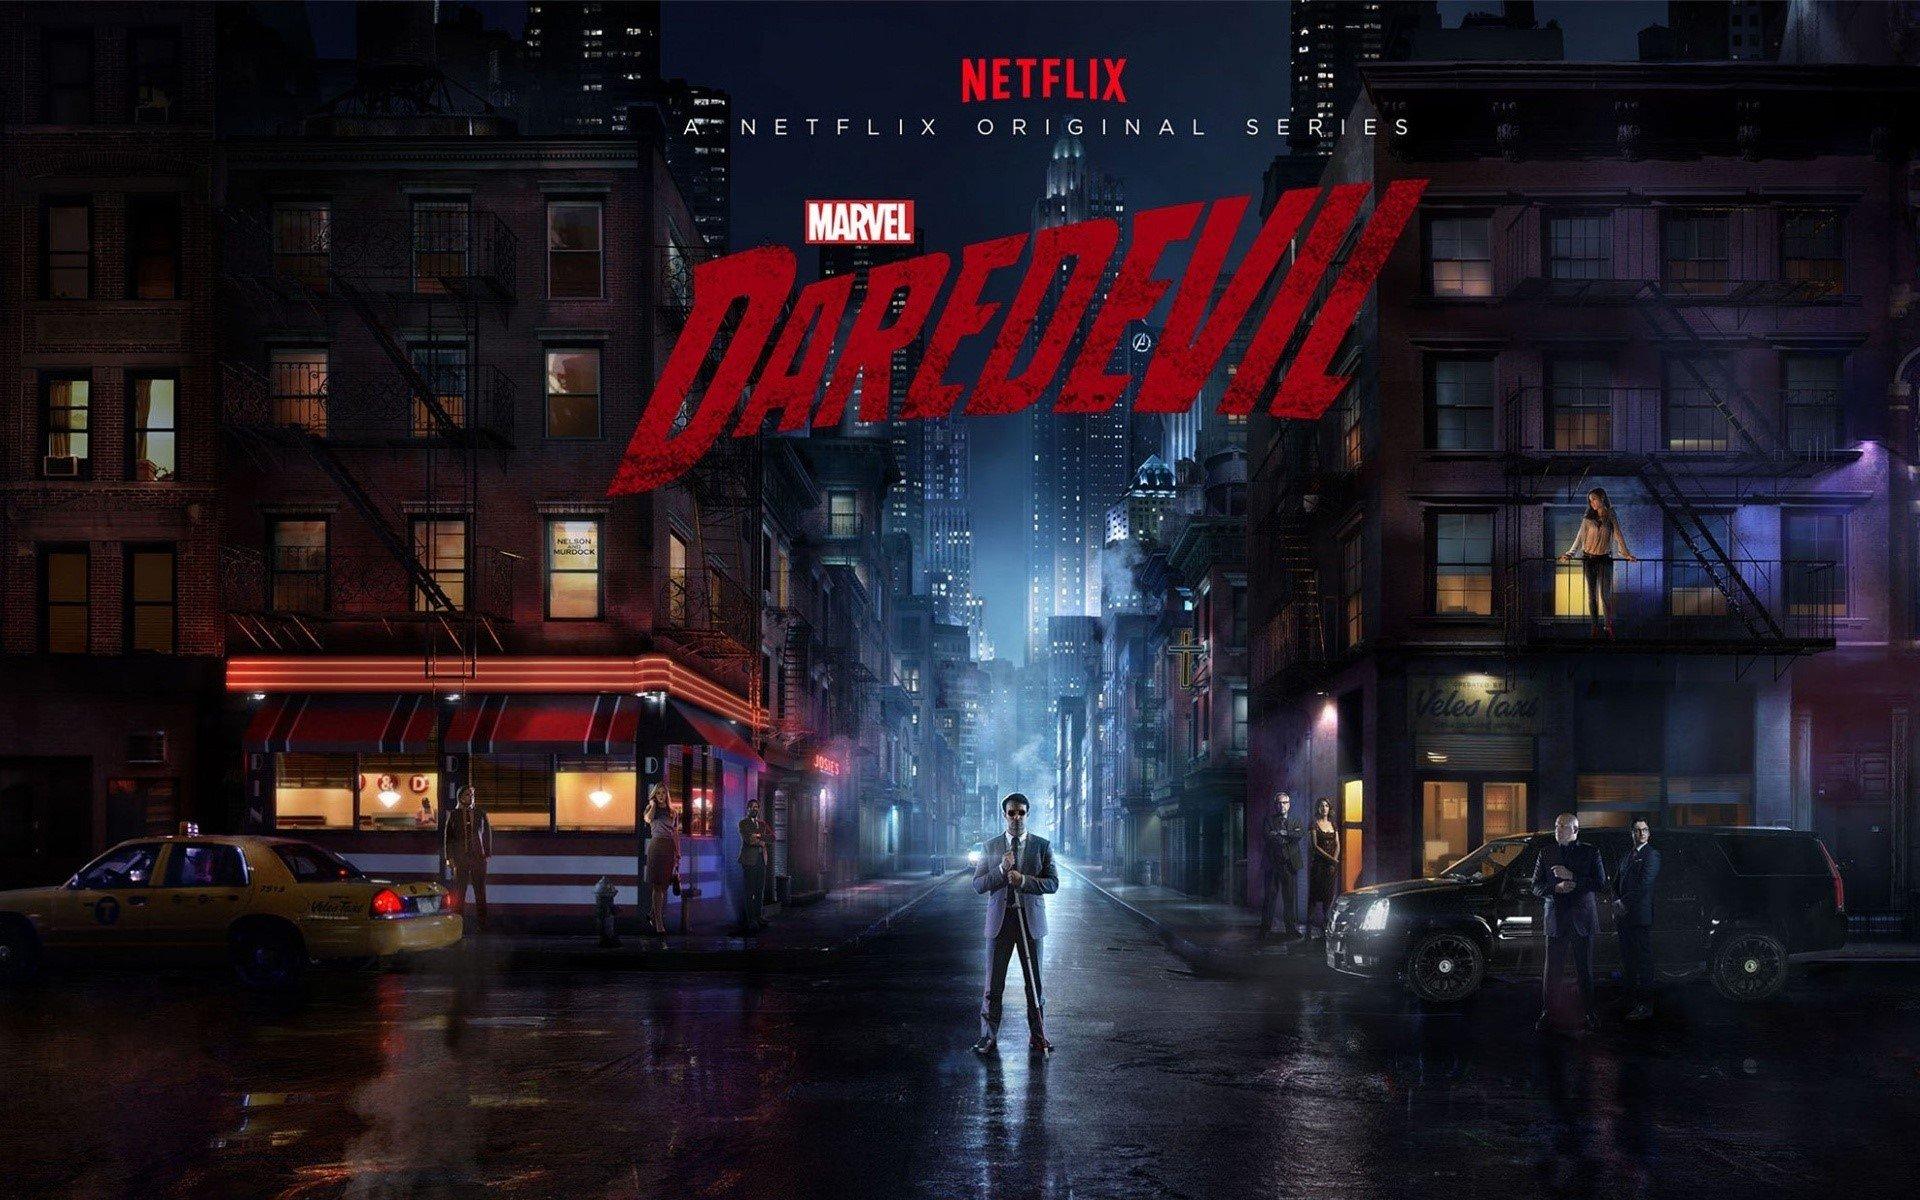 Fondos de pantalla Serie Daredevil